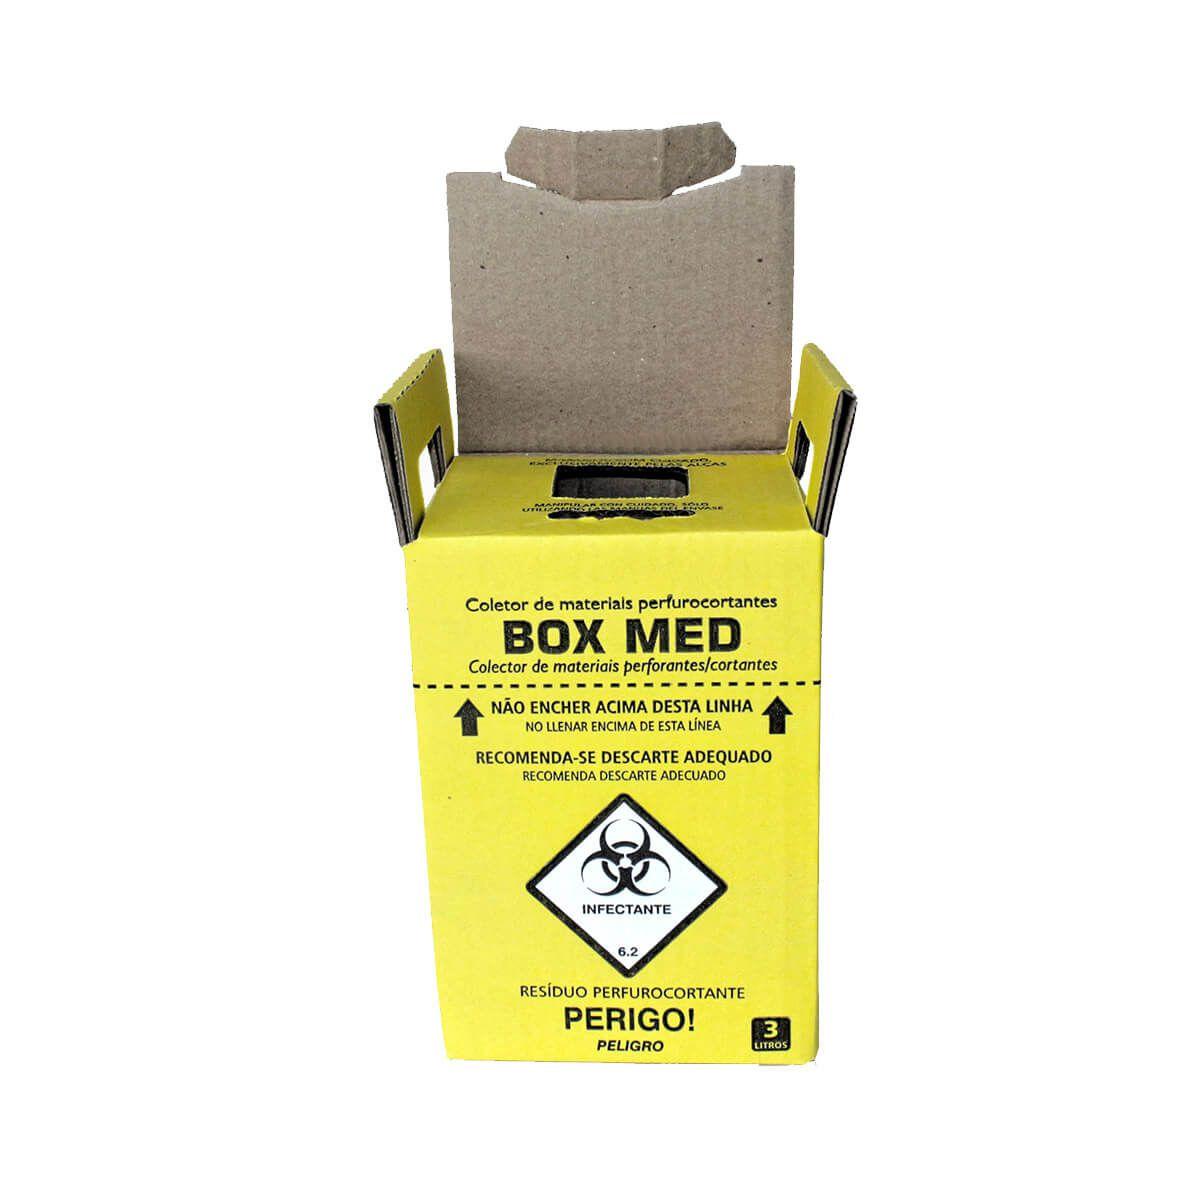 Kit 20 Caixa Coletora para Material Perfurocortante Descartável - Box Med